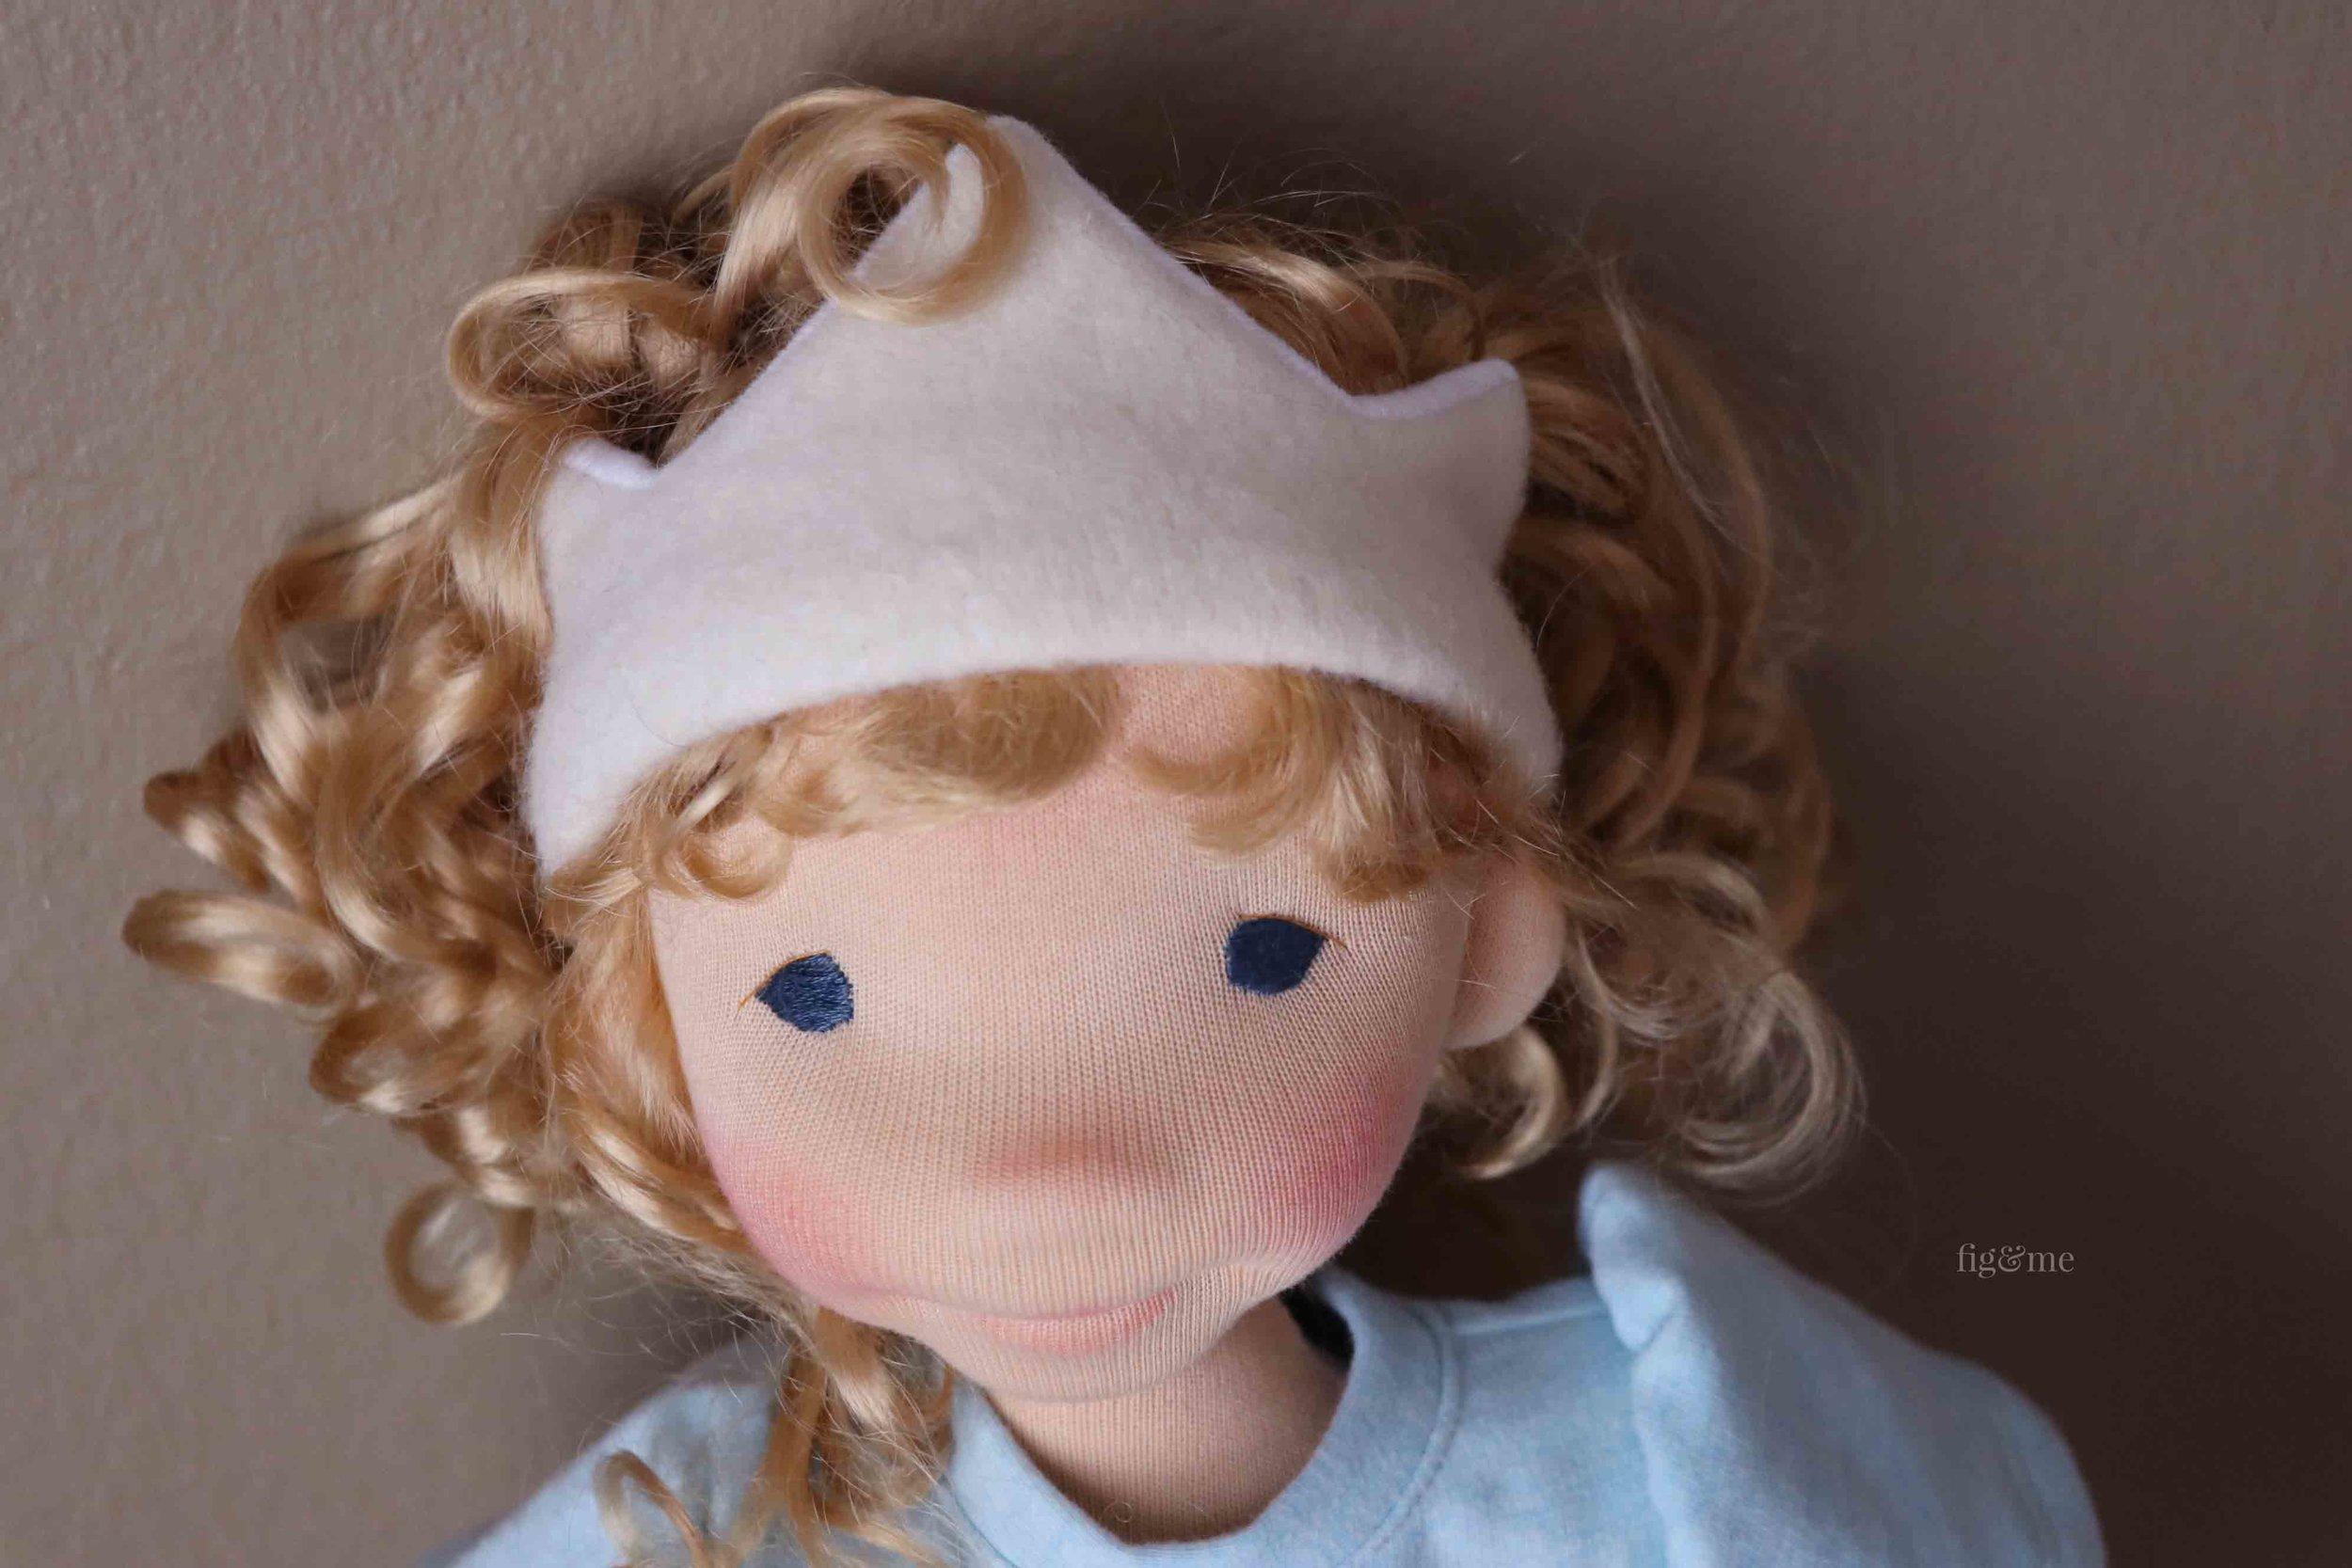 Amanda, a natural fiber art doll by Fig and Me.